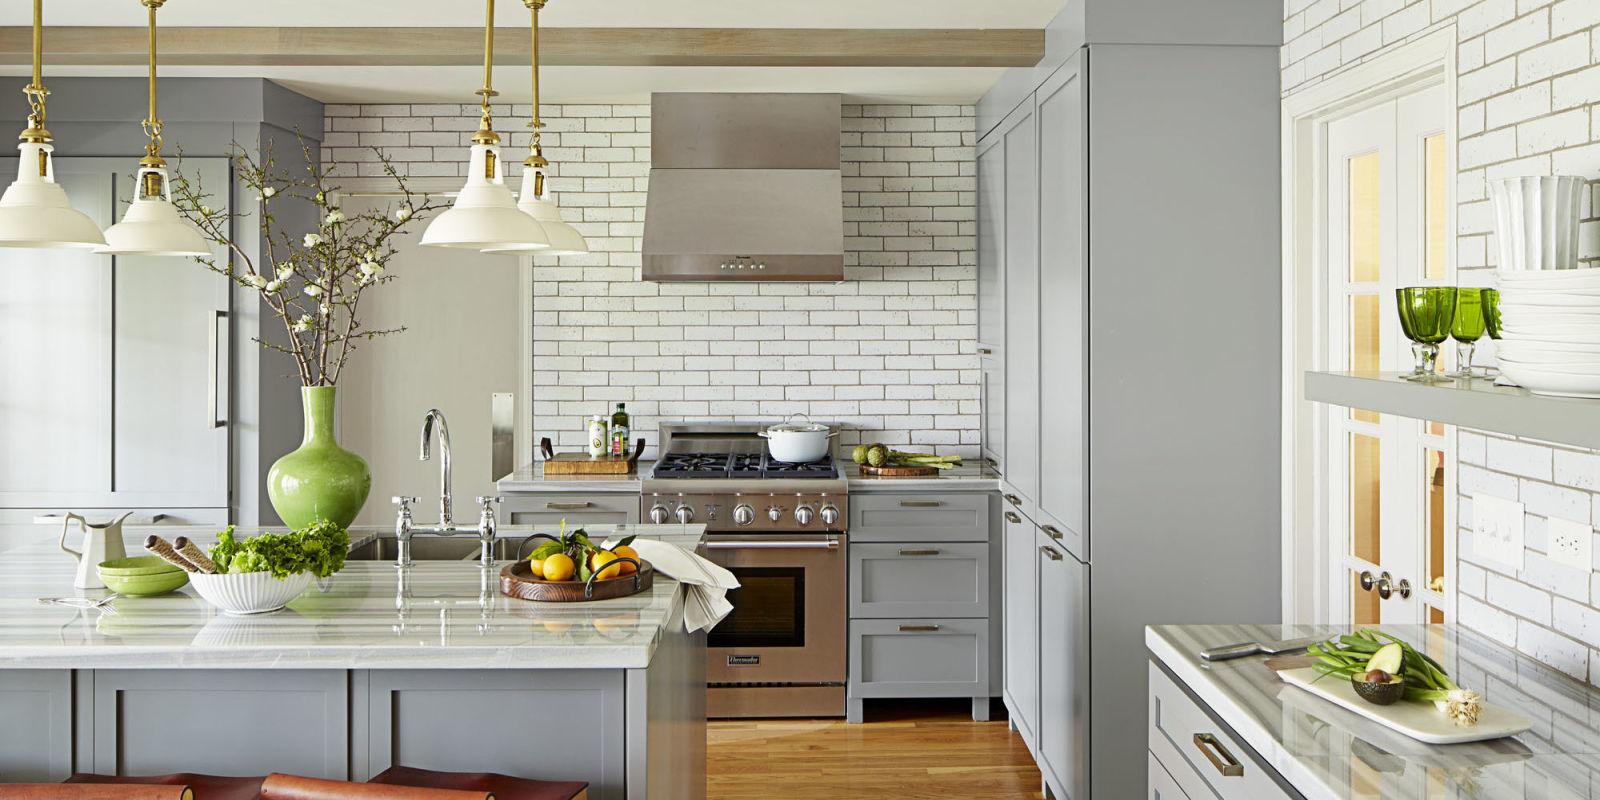 35 Best Kitchen Countertops Design Ideas - Types of ... on Kitchen Countertop Decor  id=94779